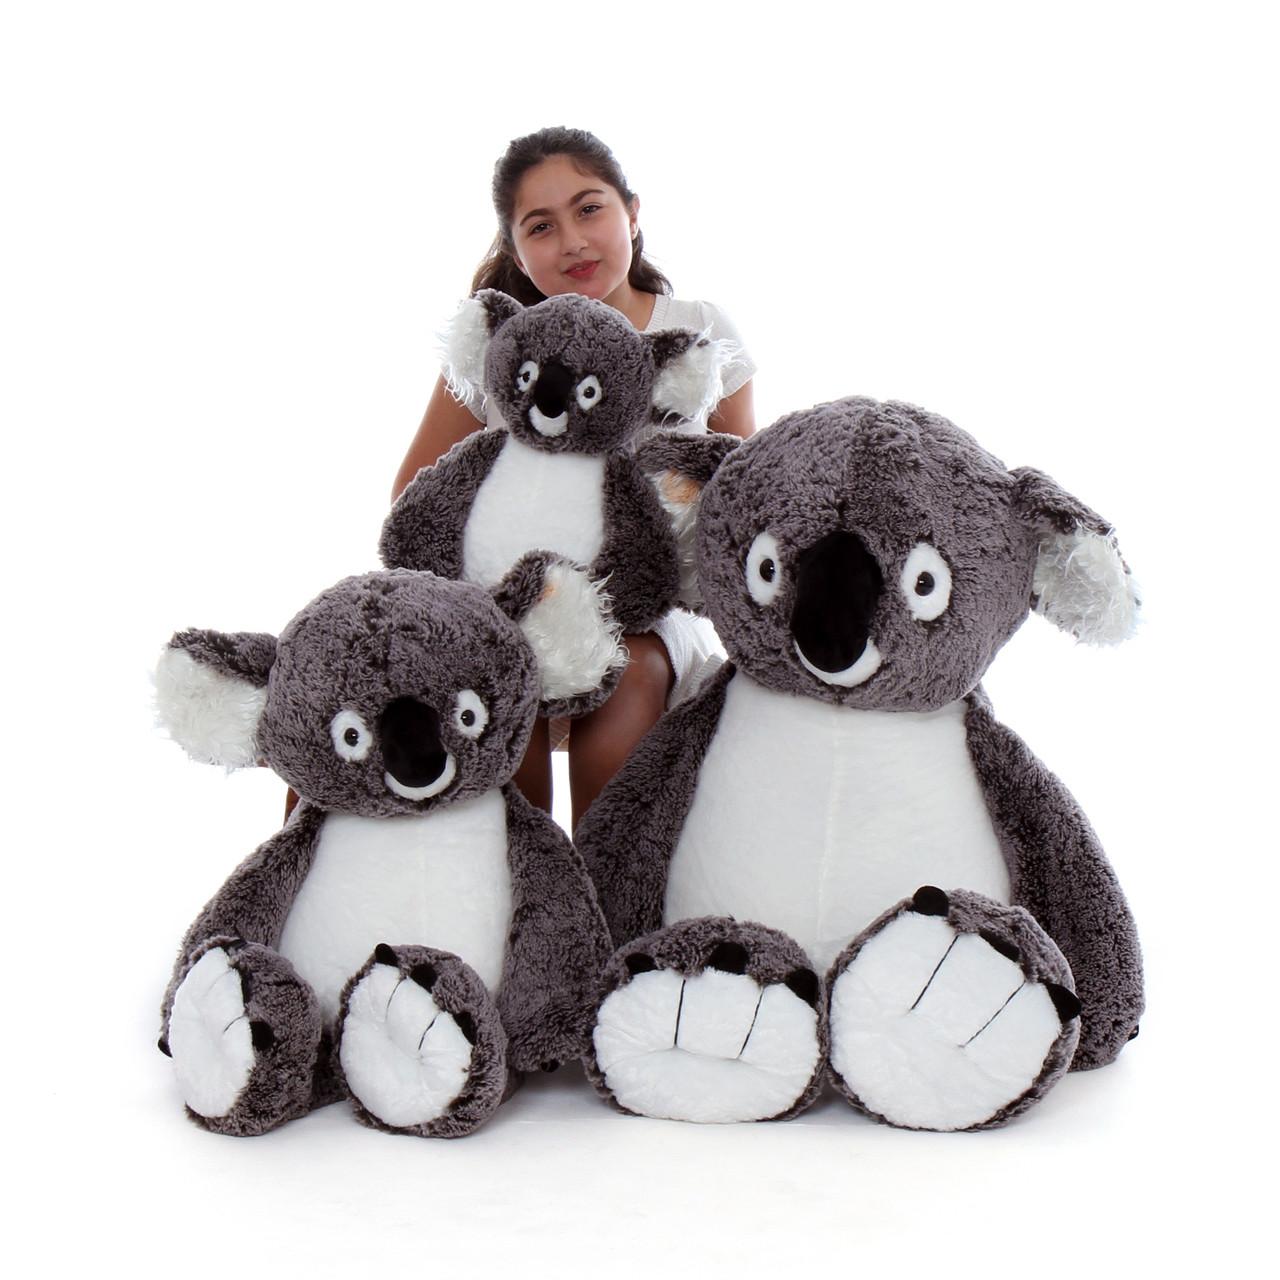 Stuffed Koalas Family from Giant Teddy